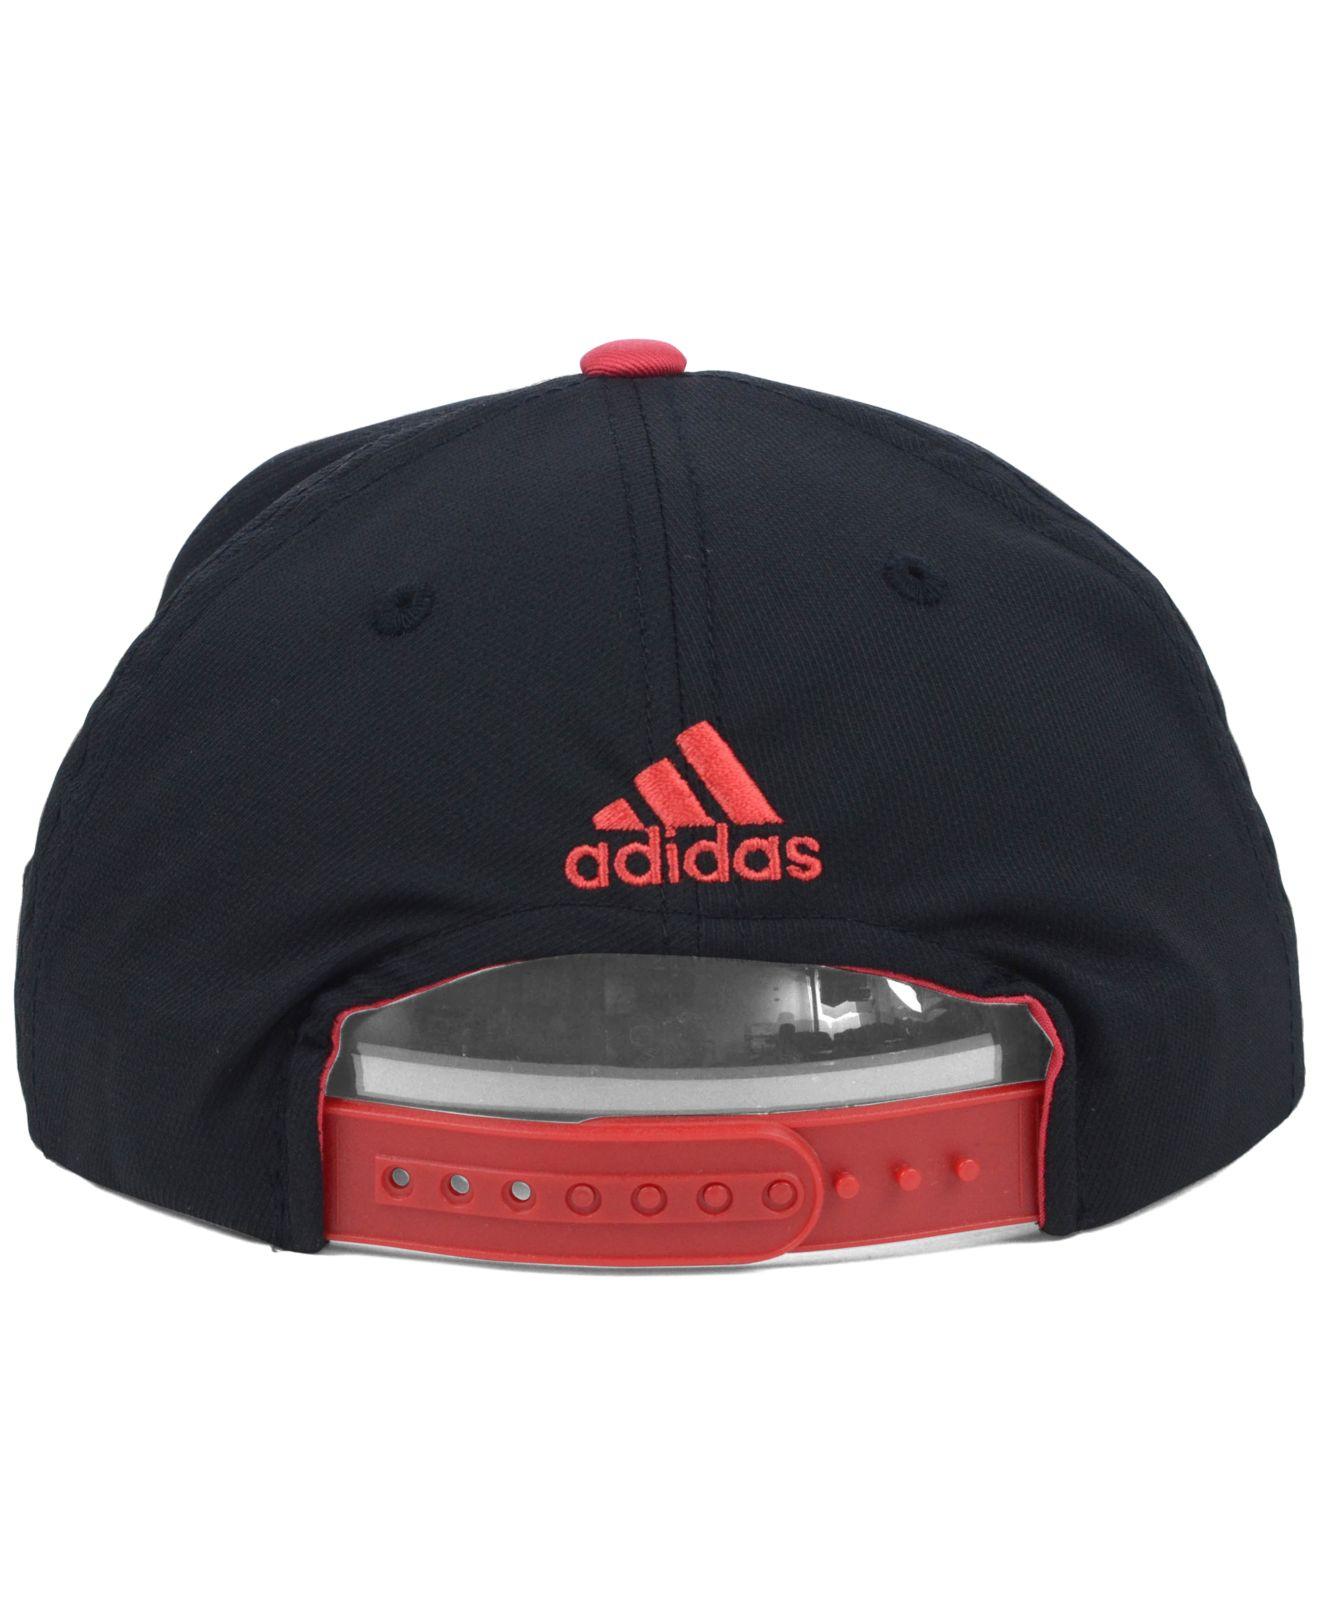 664643d2bd7 Lyst - Adidas Dc United Mls Player Snapback Cap in Black for Men